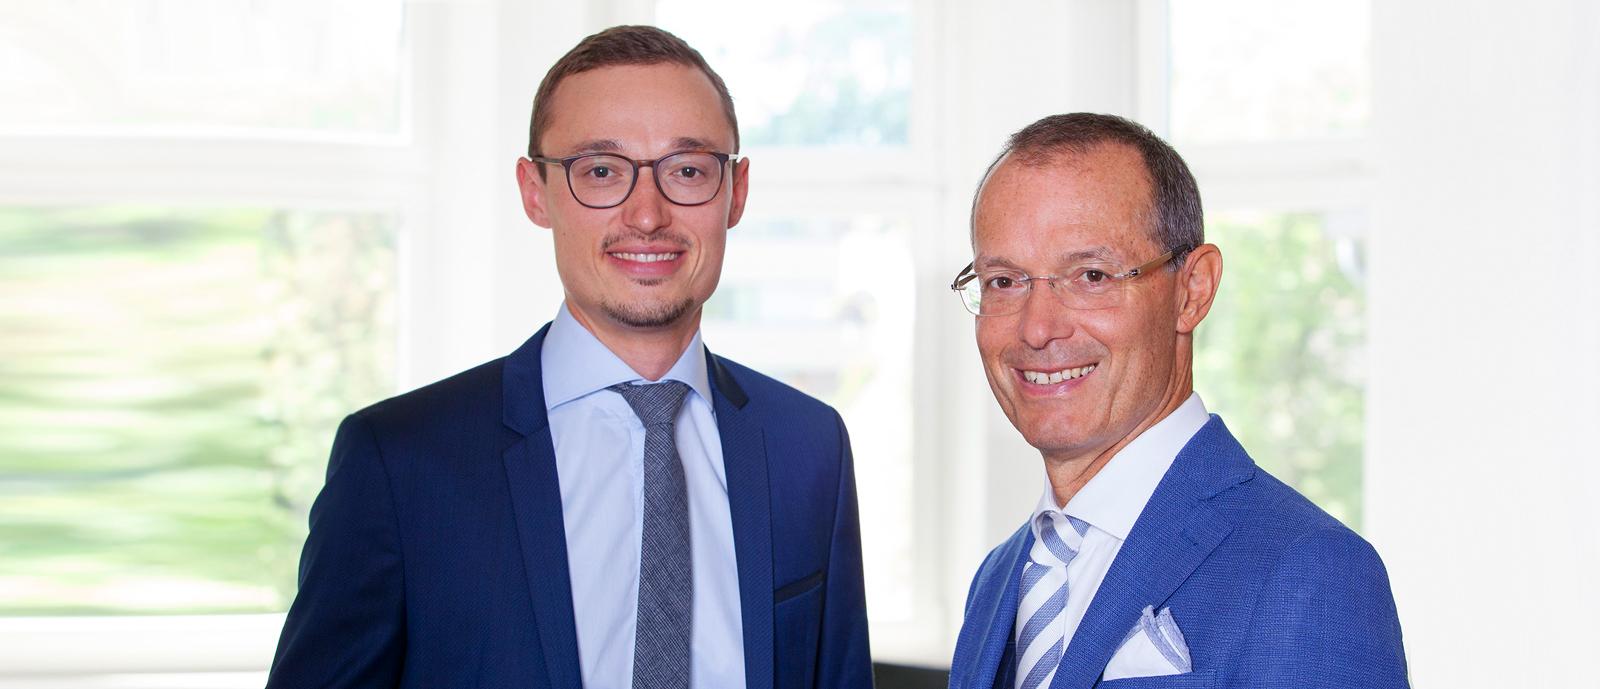 STEUERKANZLEI STEINHART & PARTNER